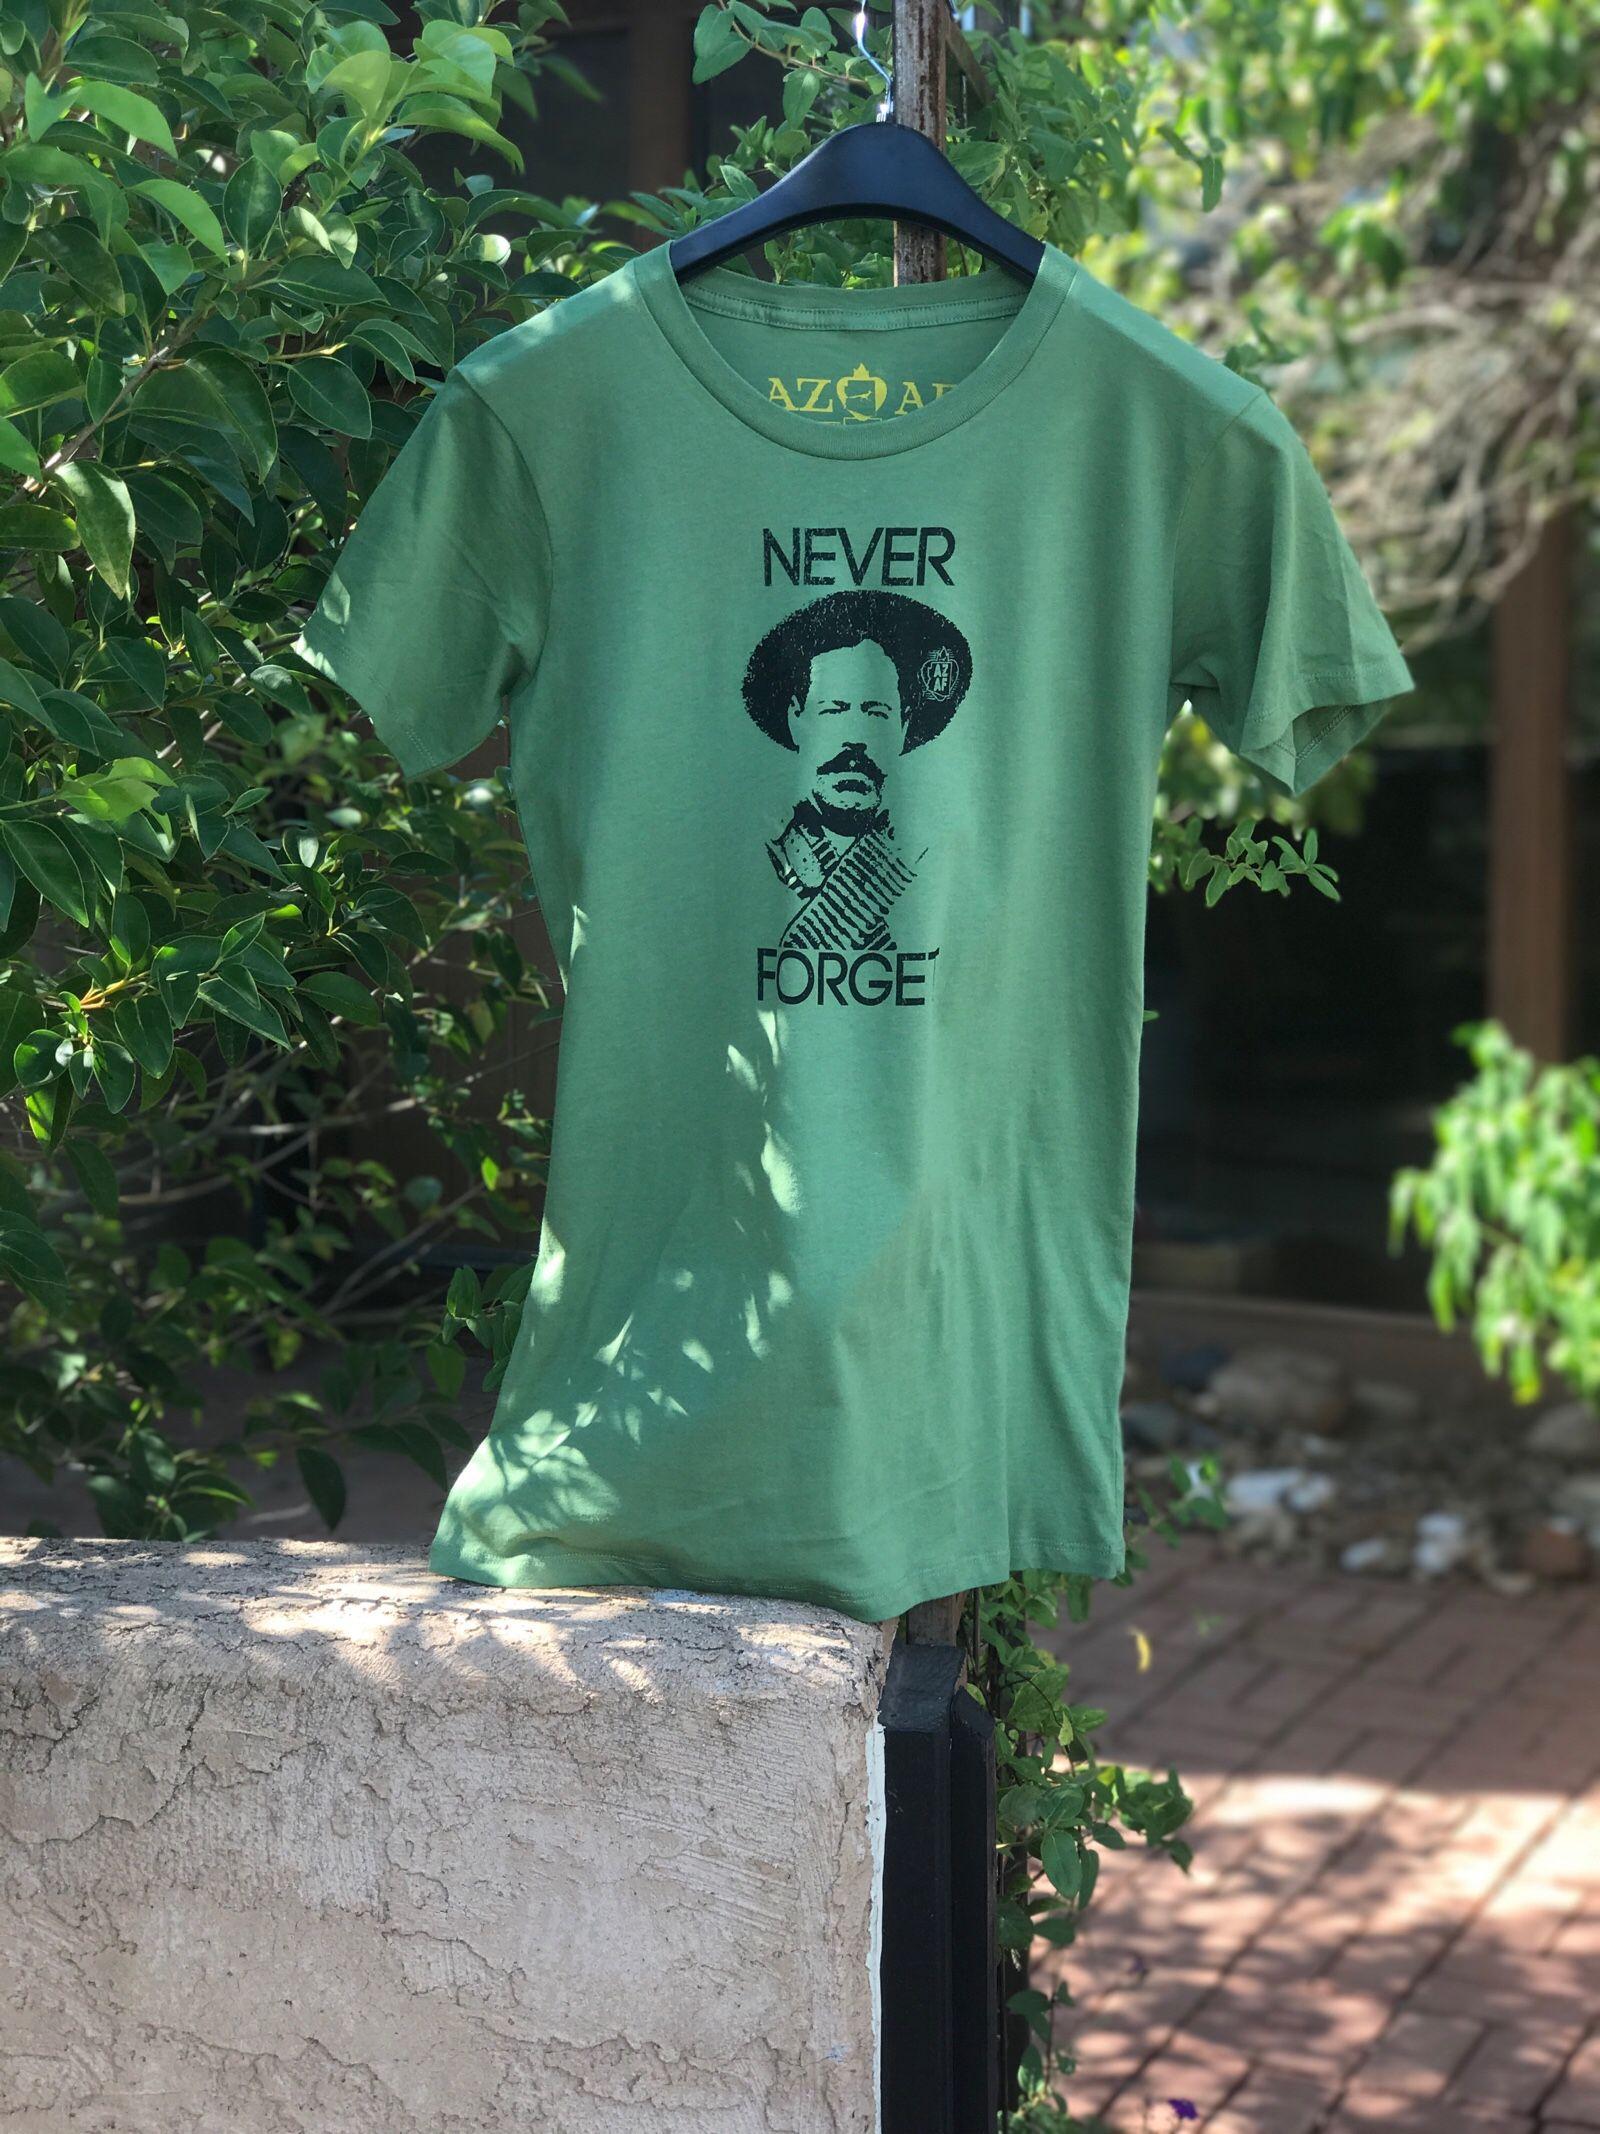 """Never Forget"" shirts feat Pancho Villa are now avail! ArizonaAF.com #supportlocal #arizonaaf #azaf #panchovilla #arizona #fashion"